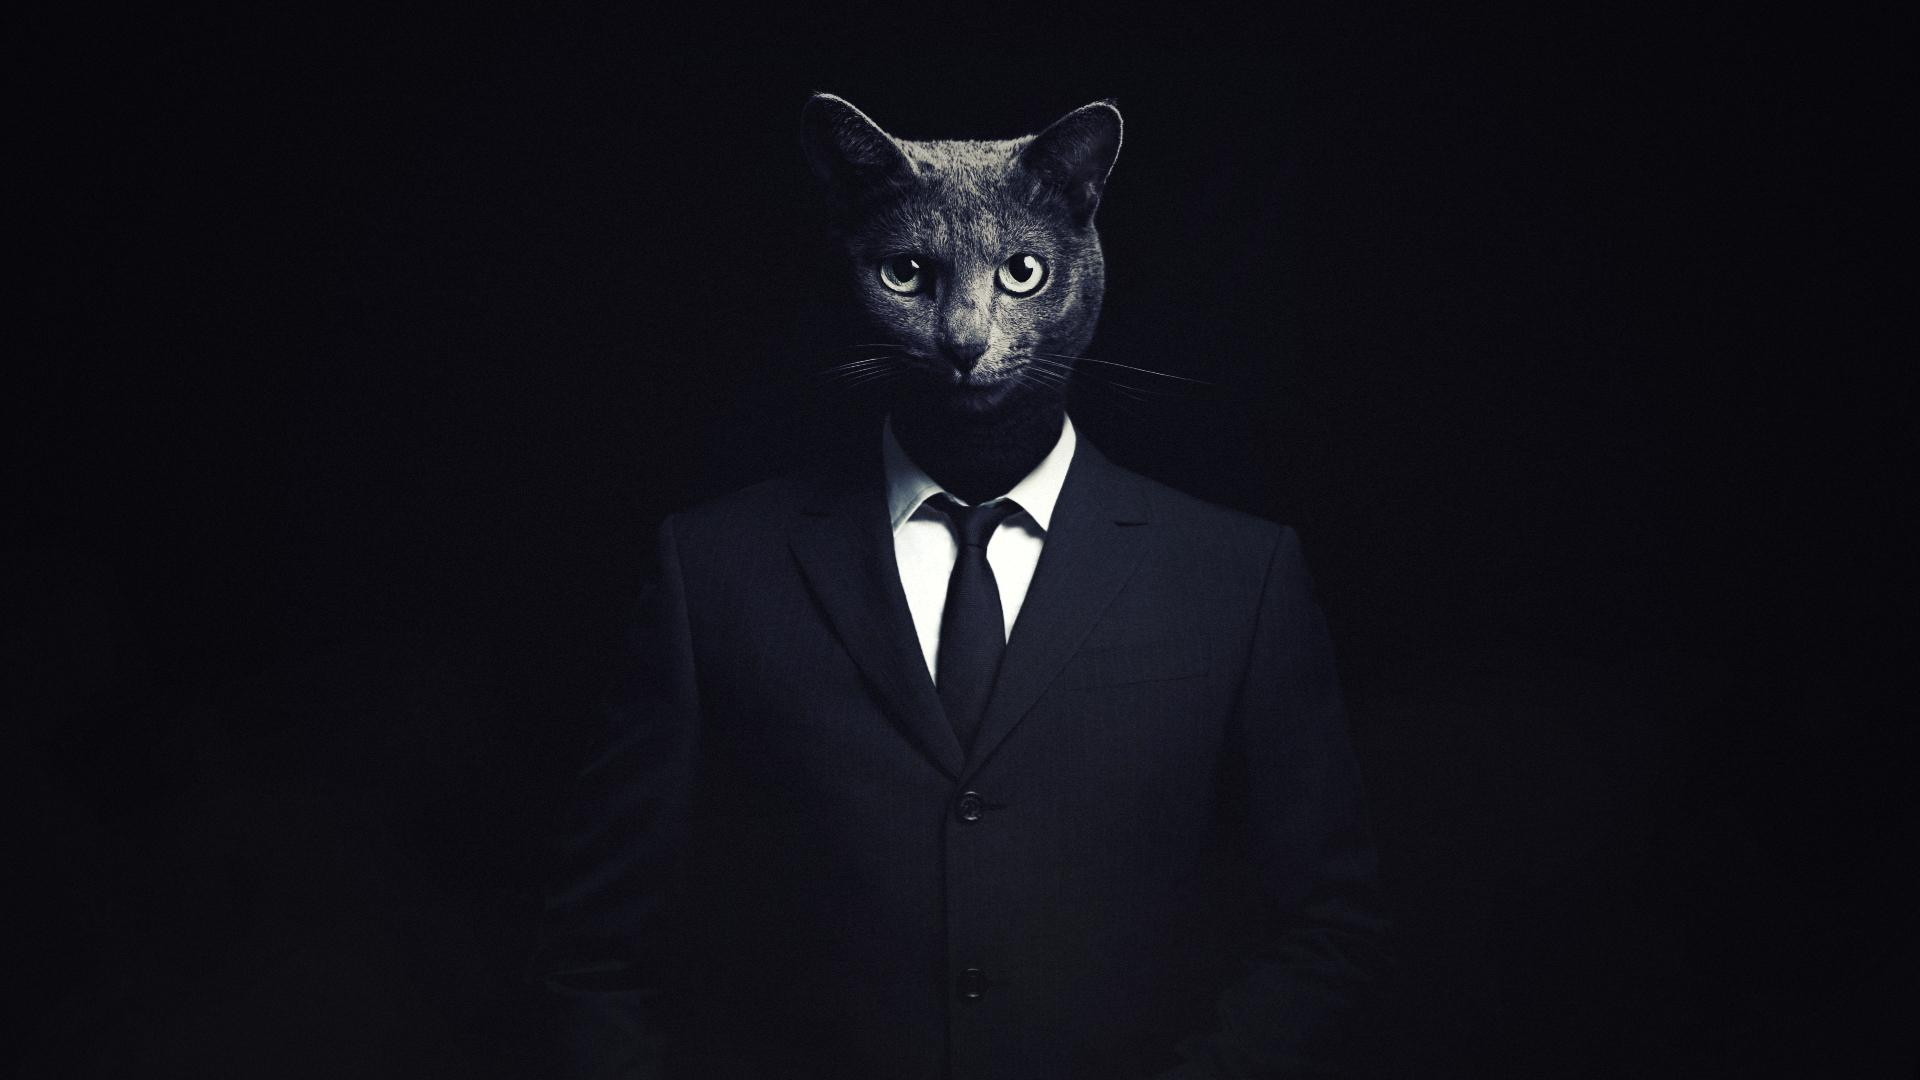 Cat the killer by Hshamsi